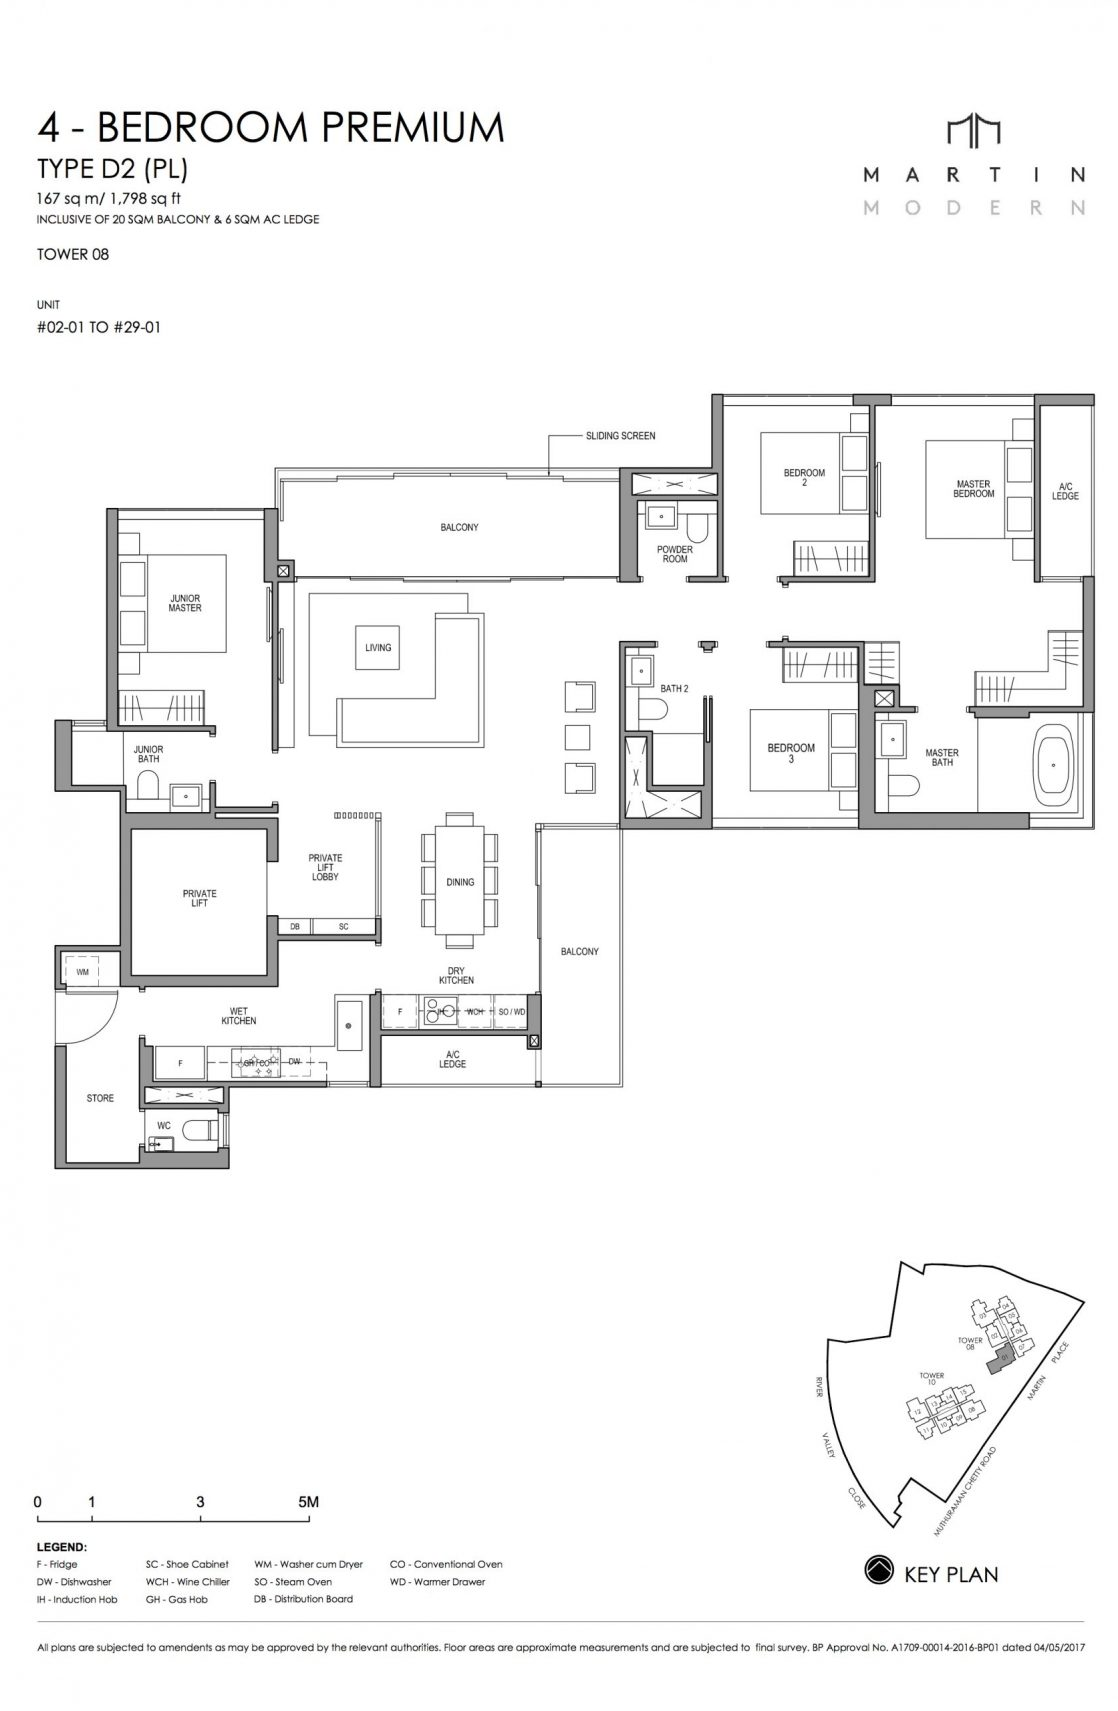 MARTIN MODERN 4-Bedroom TYPE D2PL